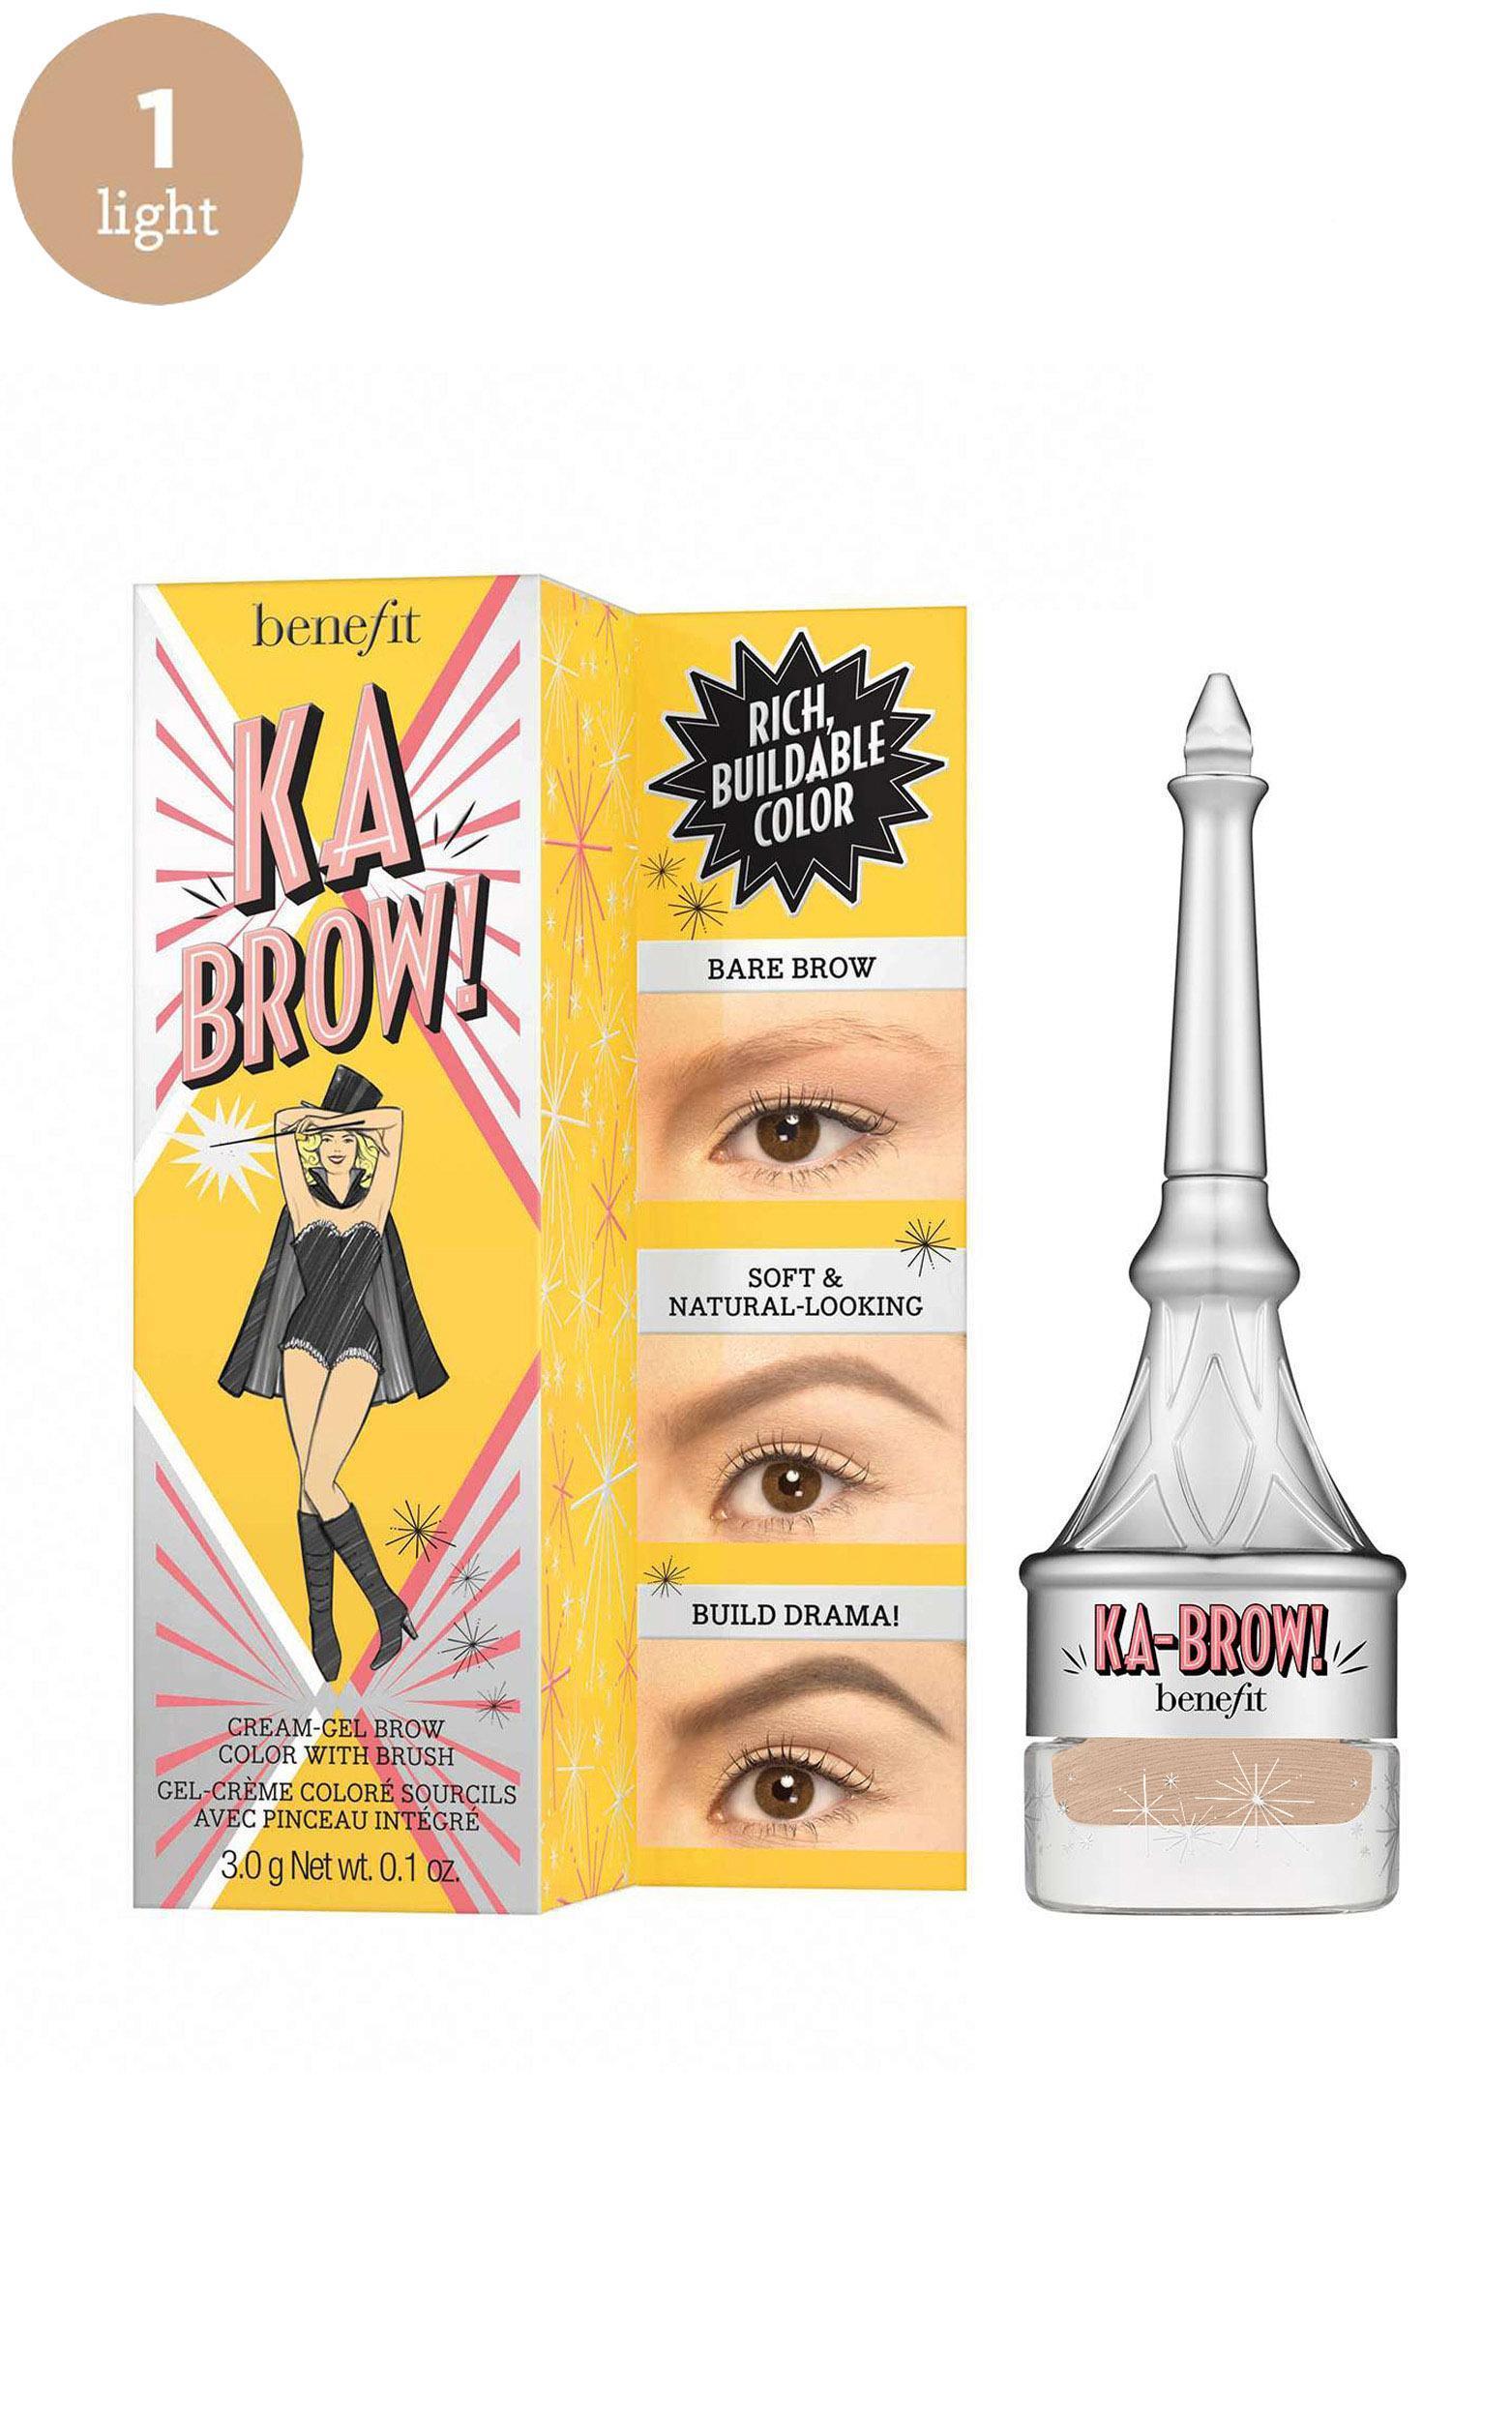 Benefit Cosmetics - Ka-BROW! Eyebrow Cream-Gel Colour in 1 - Cool Light Blonde, Beige, hi-res image number null